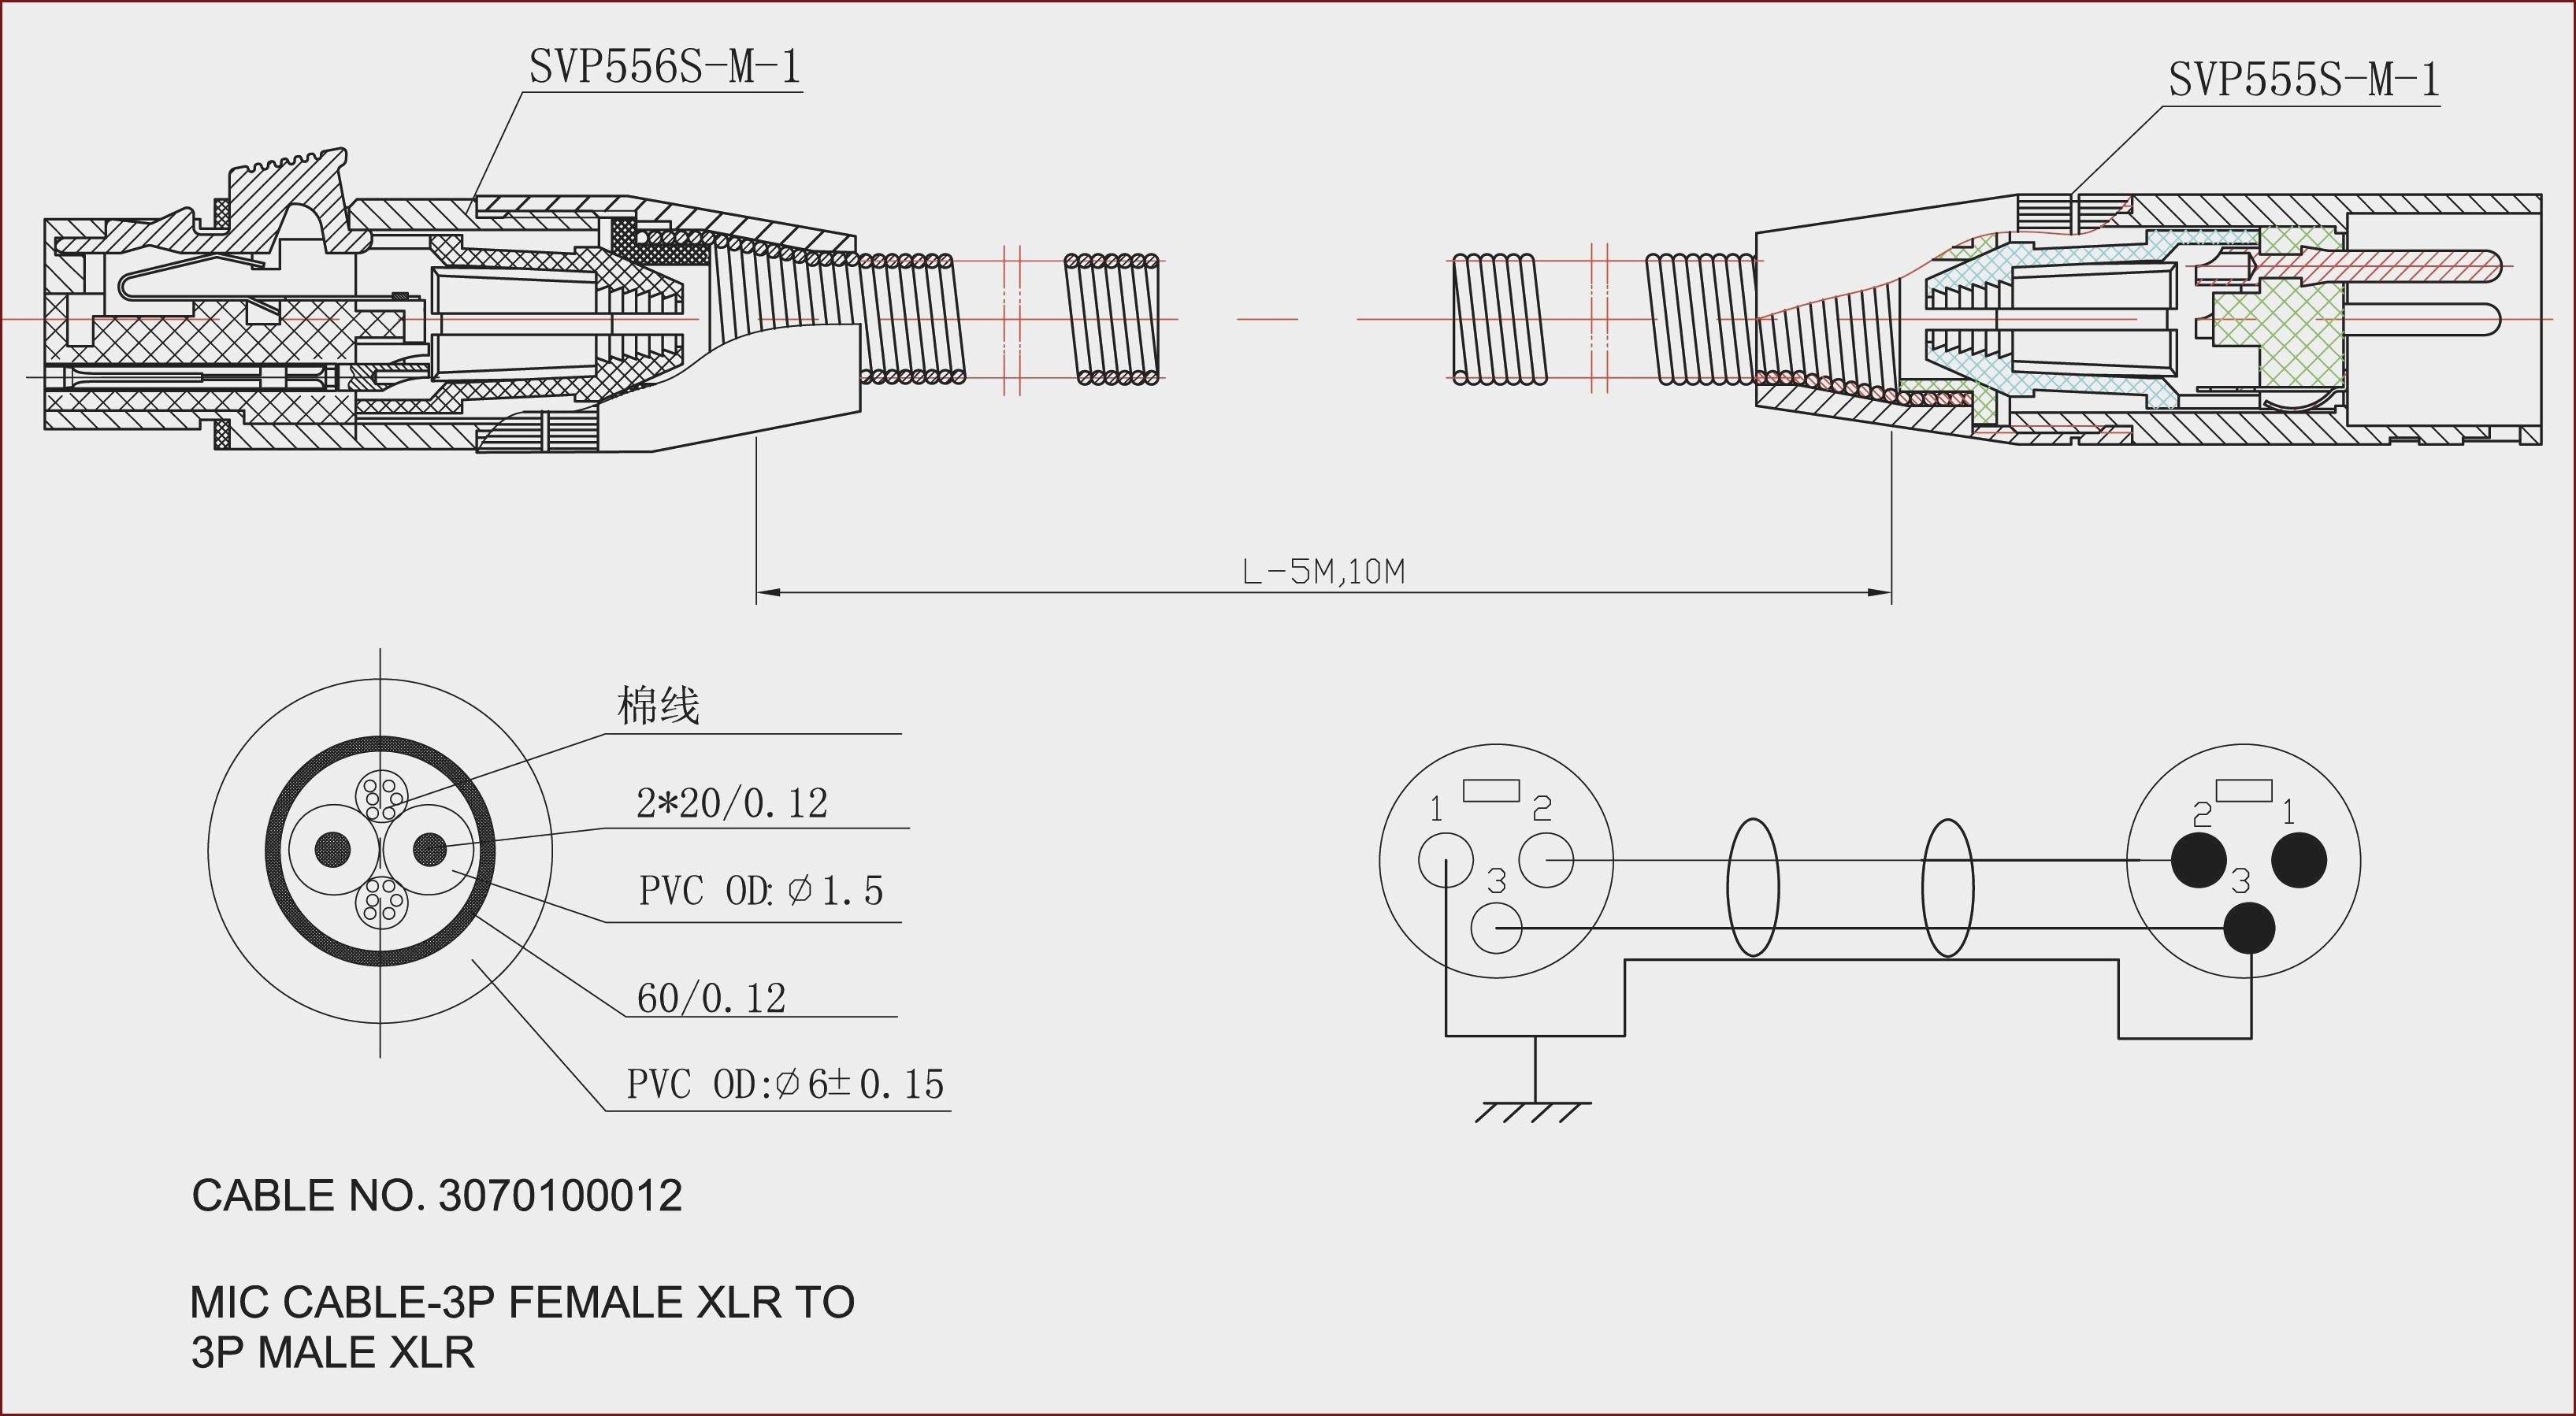 2001 F350 Wiring Diagram Rear Lights 7 Pin Flat Trailer Wiring Diagram Australia Wiring Diagram Of 2001 F350 Wiring Diagram Rear Lights